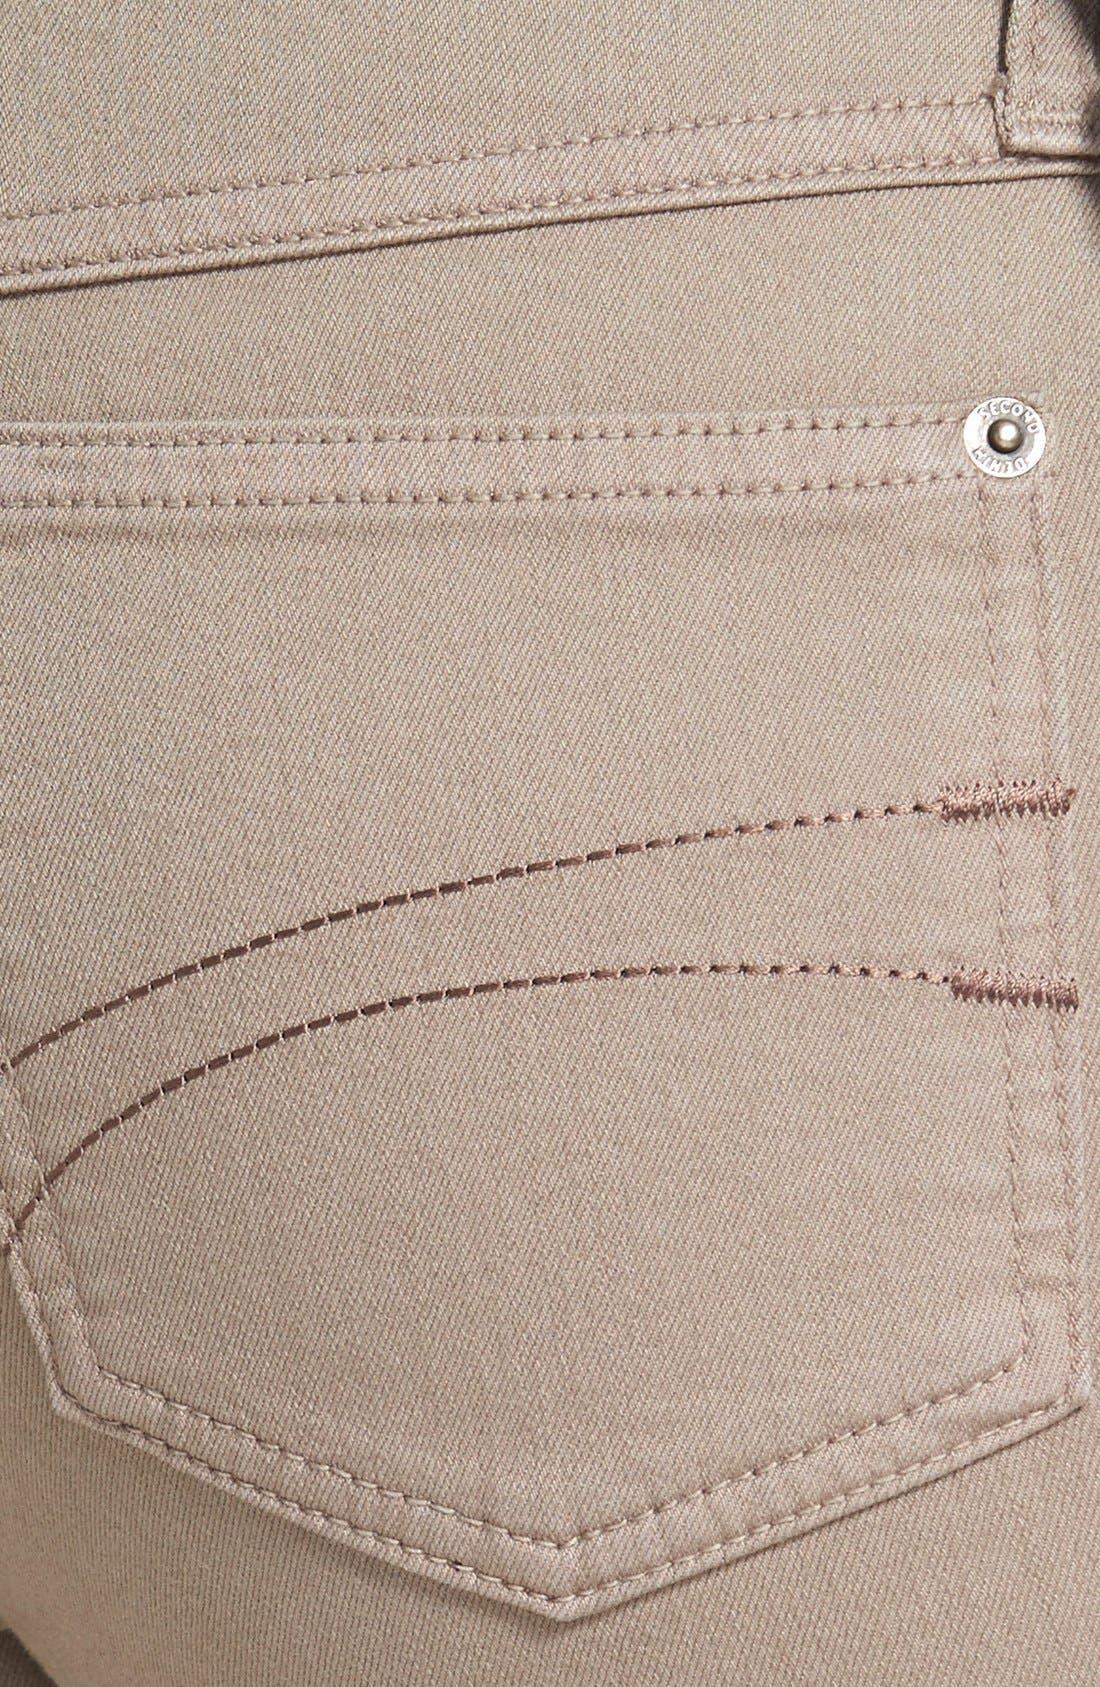 Alternate Image 3  - Second Yoga Jeans Capri Jeans